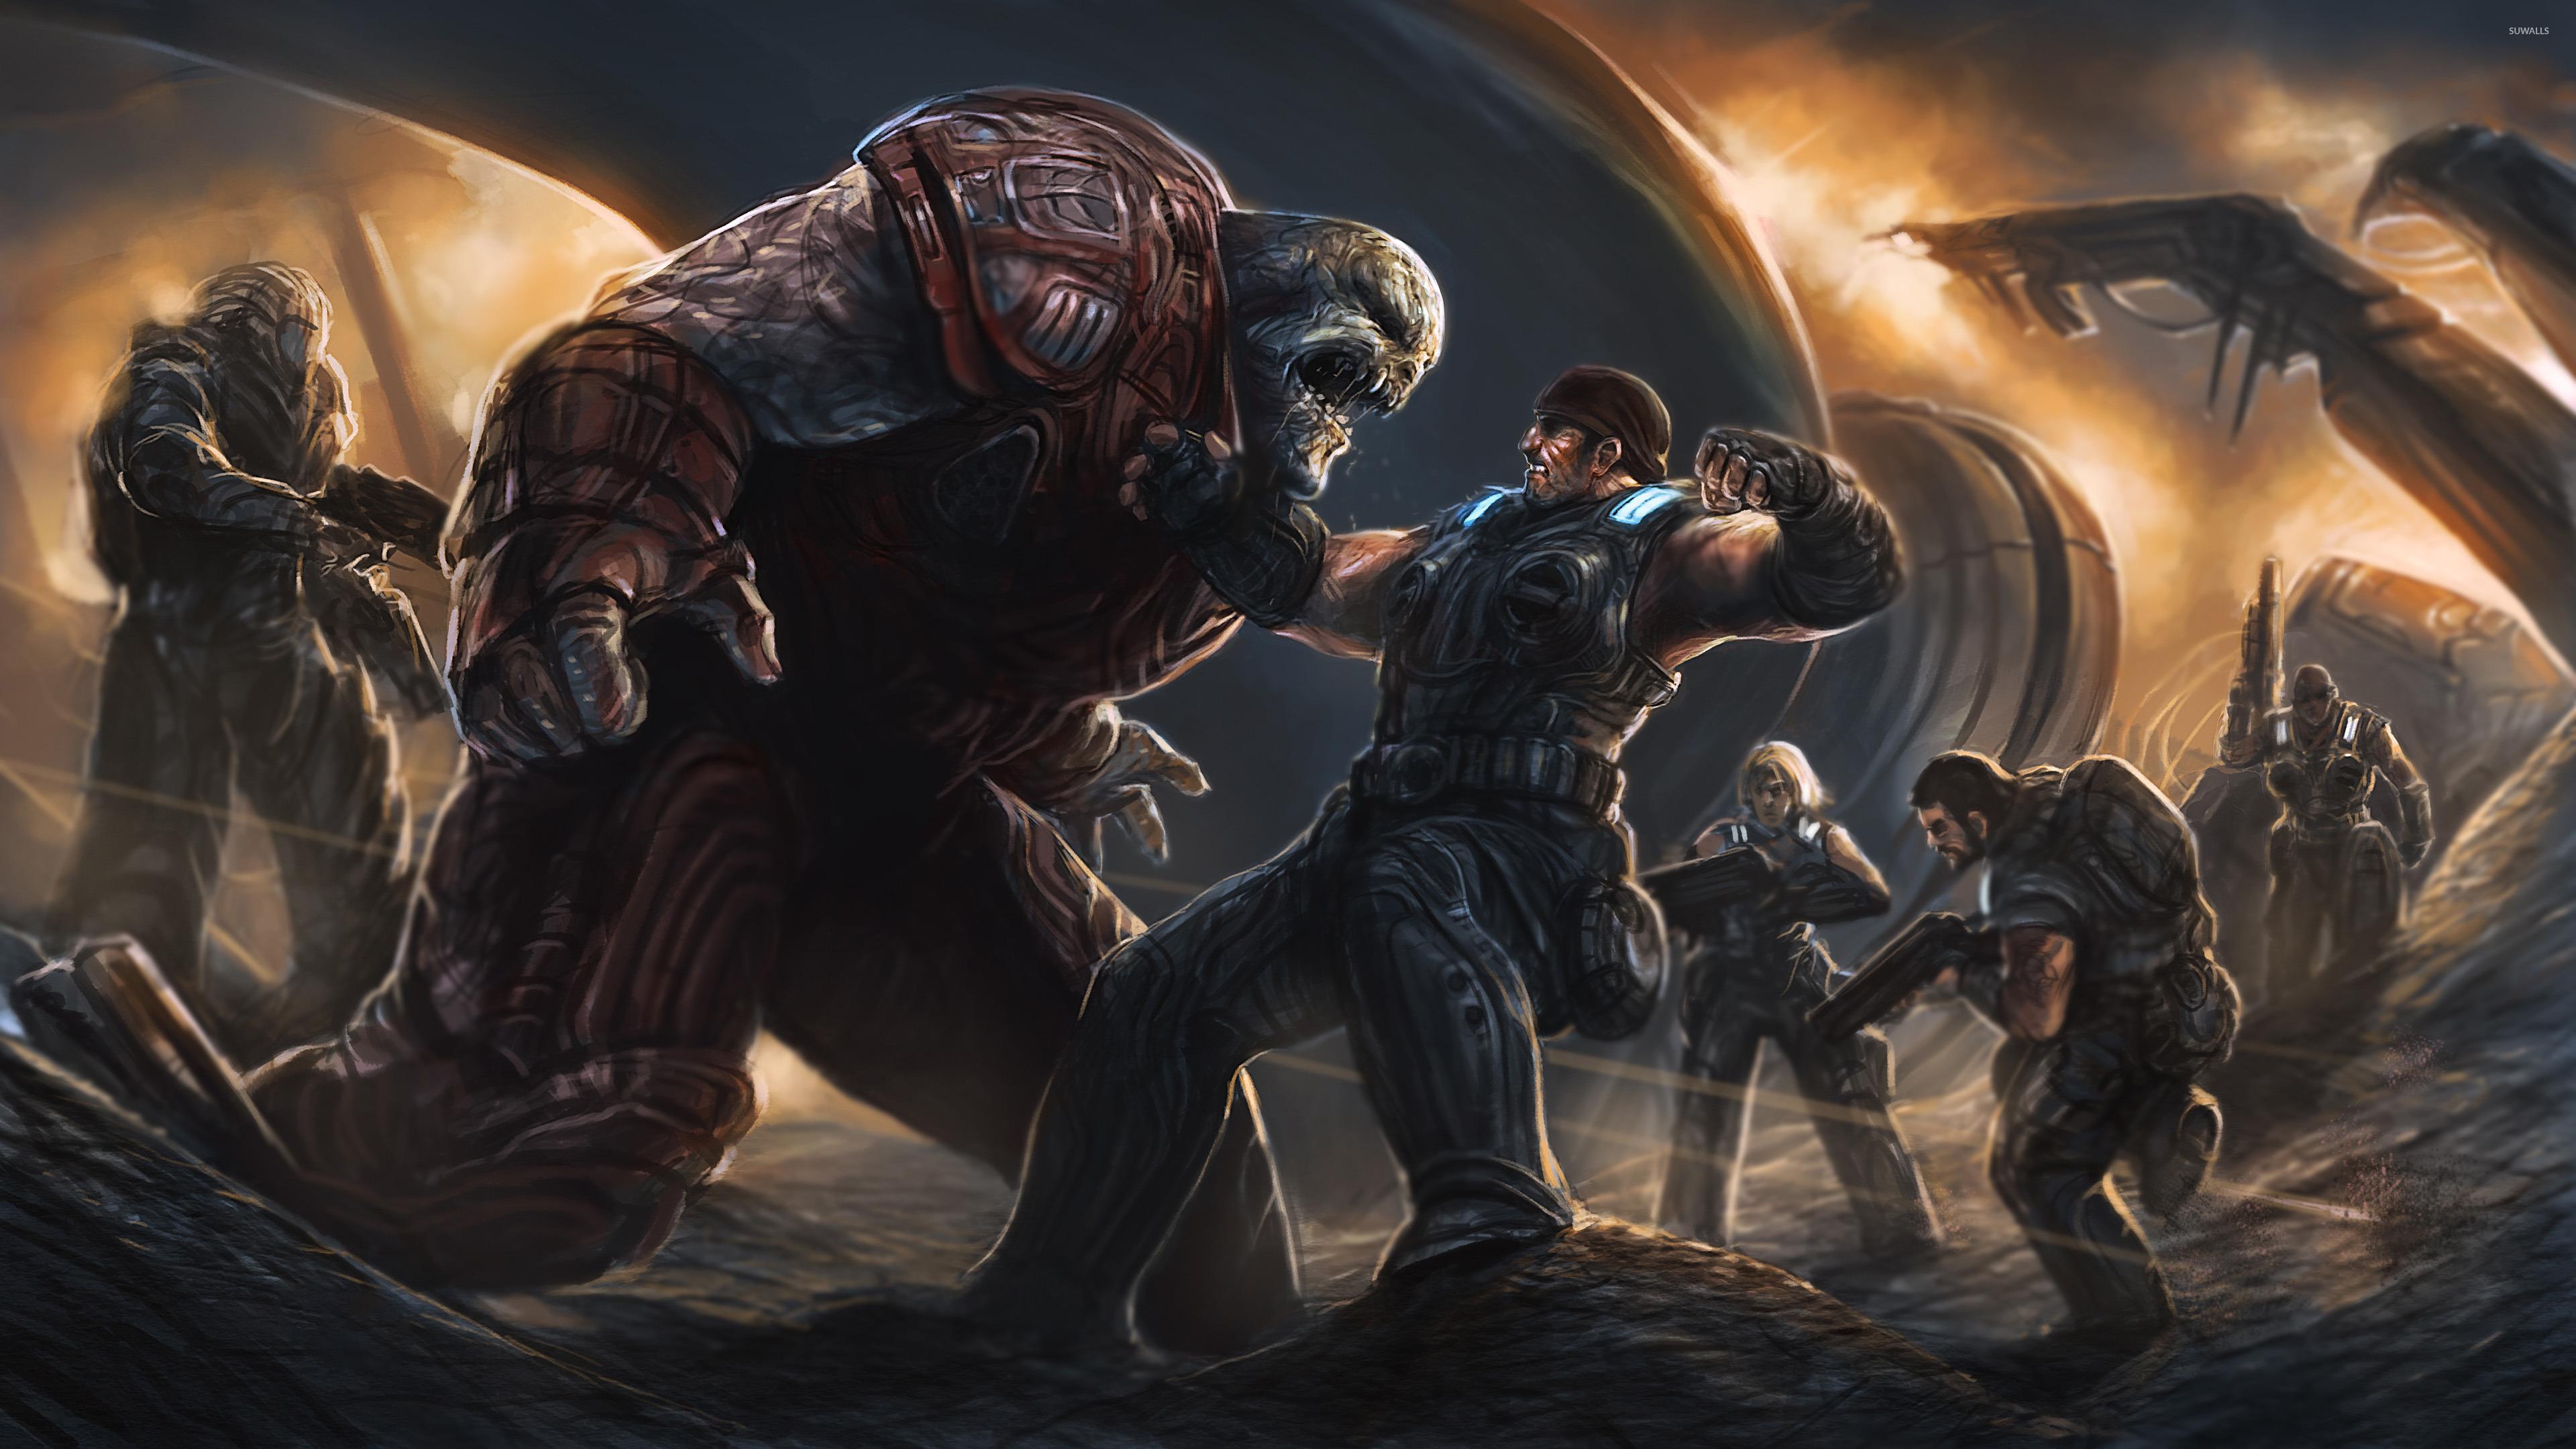 Gears Of War 4 2016 Video Game 4k Hd Desktop Wallpaper For: Gears Of War 4 Wallpaper